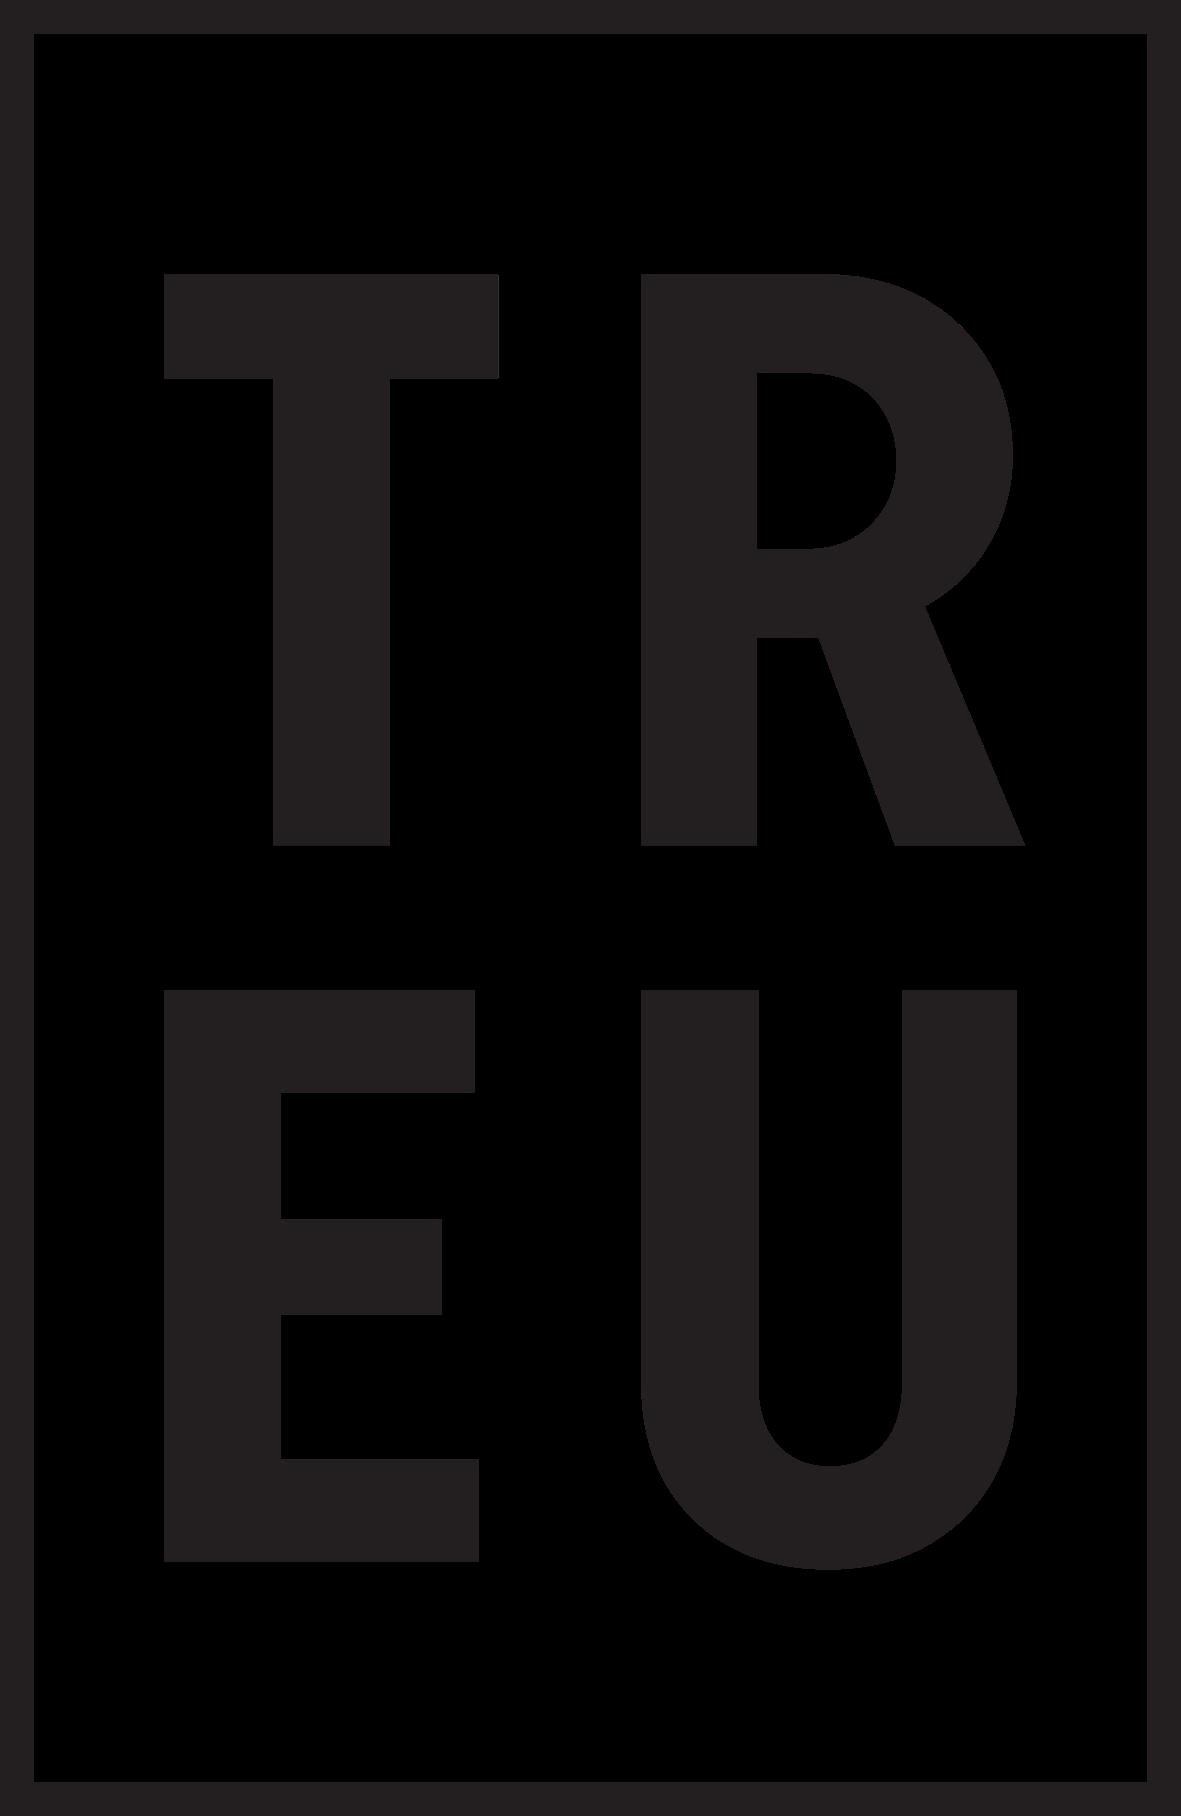 TREU-logo-WIT